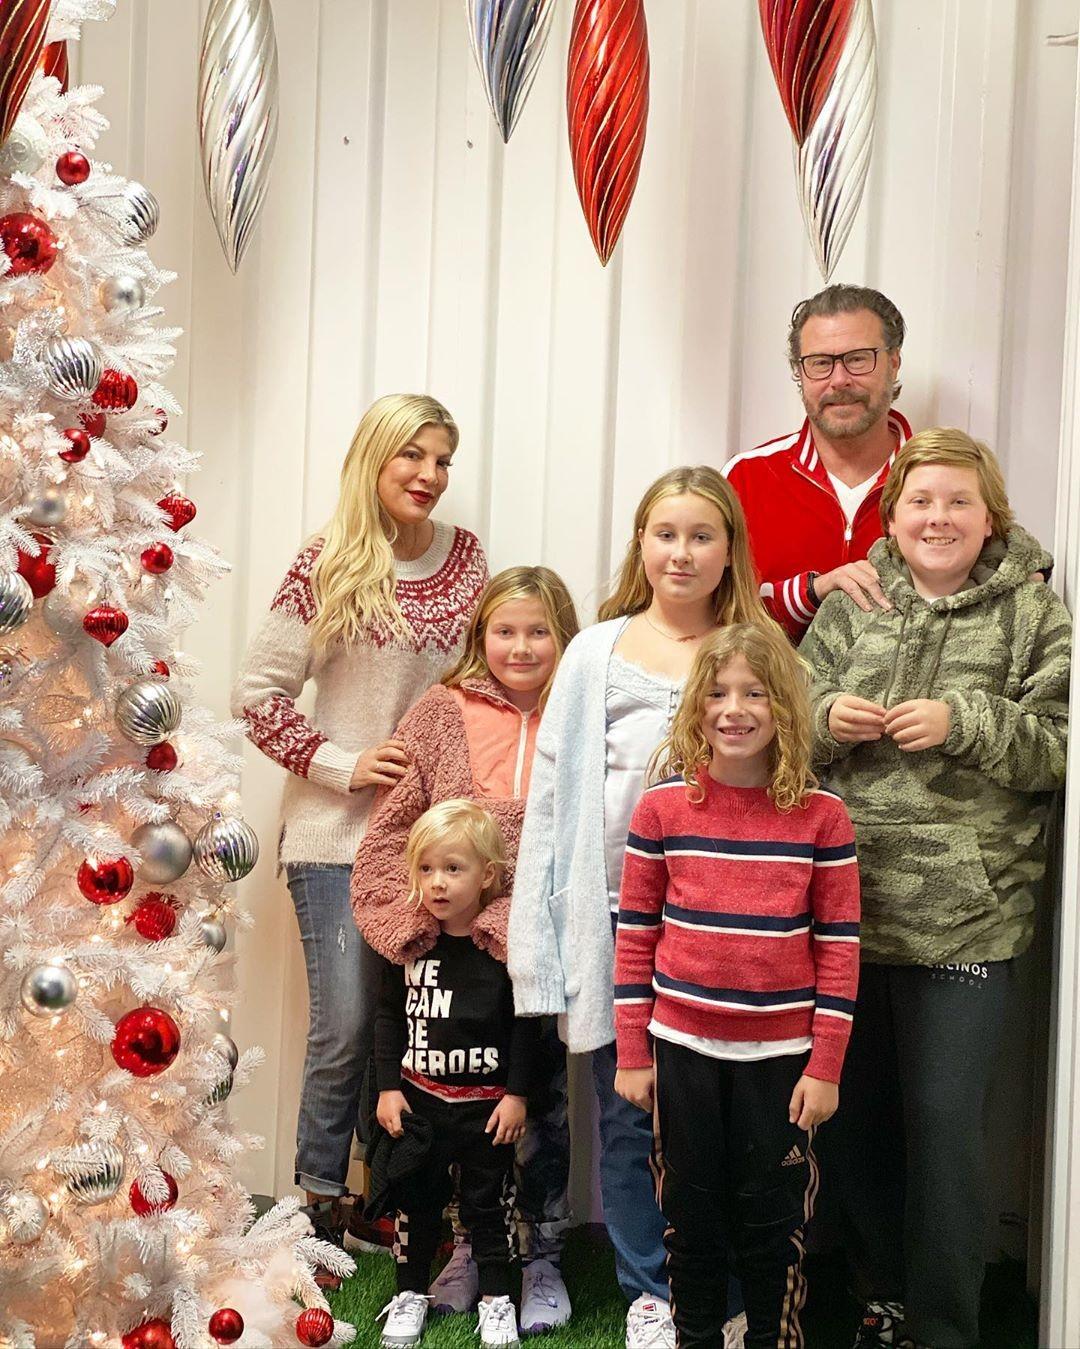 Tori Spelling, Dean McDermott e seus filhos: Liam, Stella, Hattie, Finn e Beau (Foto: Reprodução / Instagram)